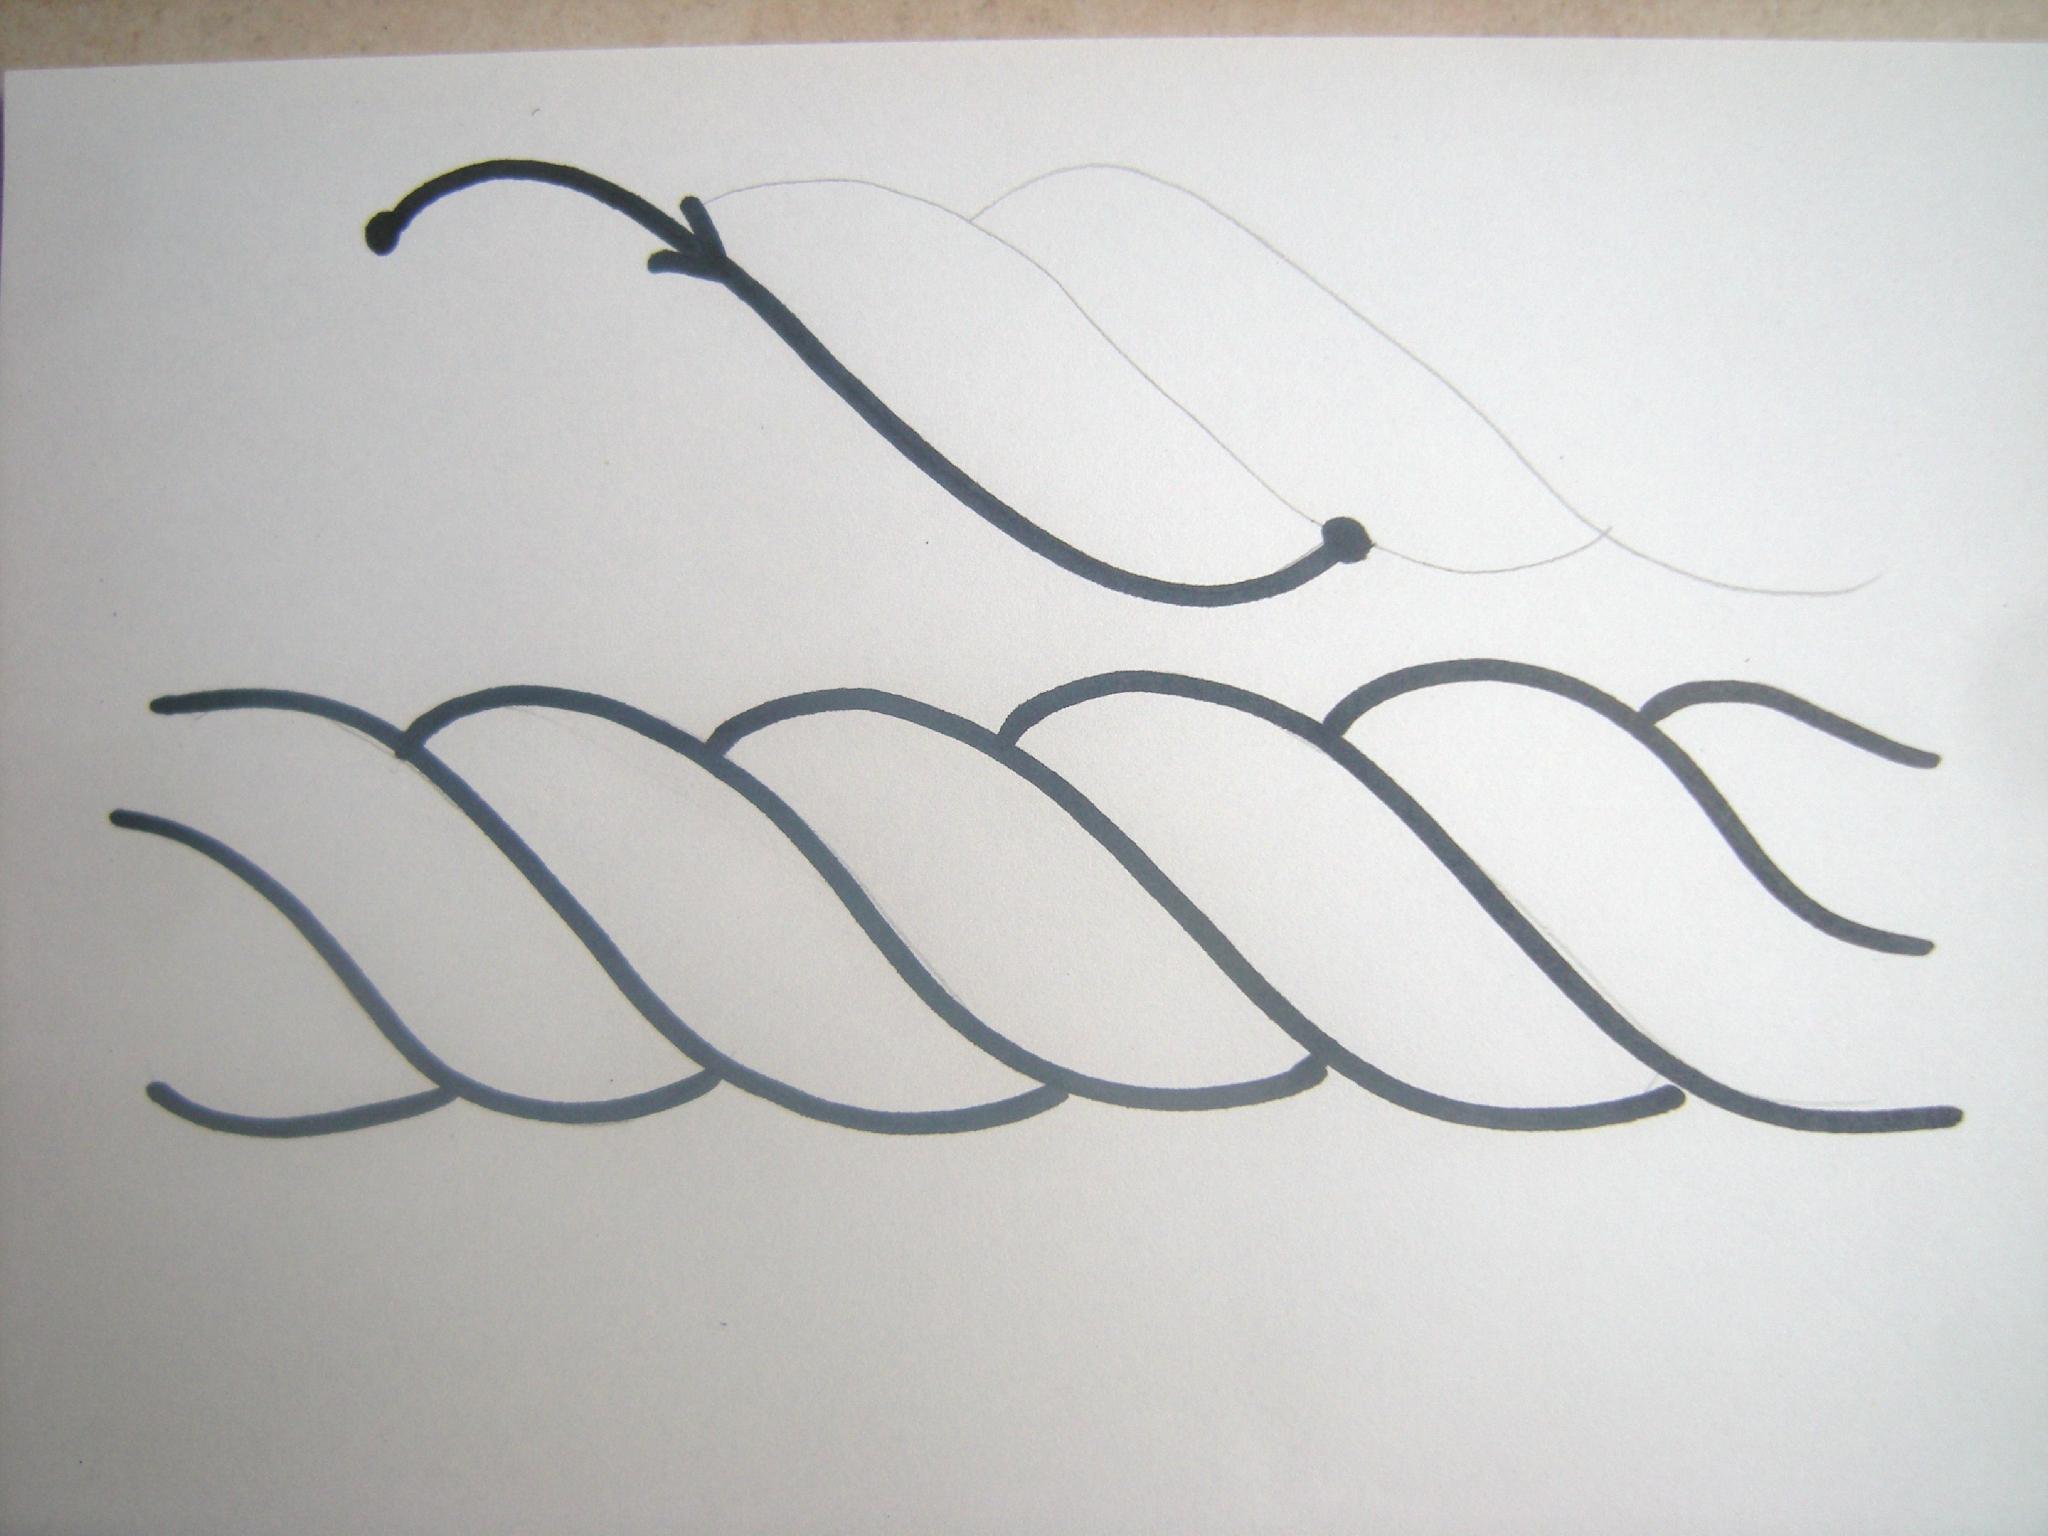 Comment Dessiner Une Corde En 3D - Domi Dessins Et Peintures encequiconcerne Dessin D Halloween Facile A Dessiner